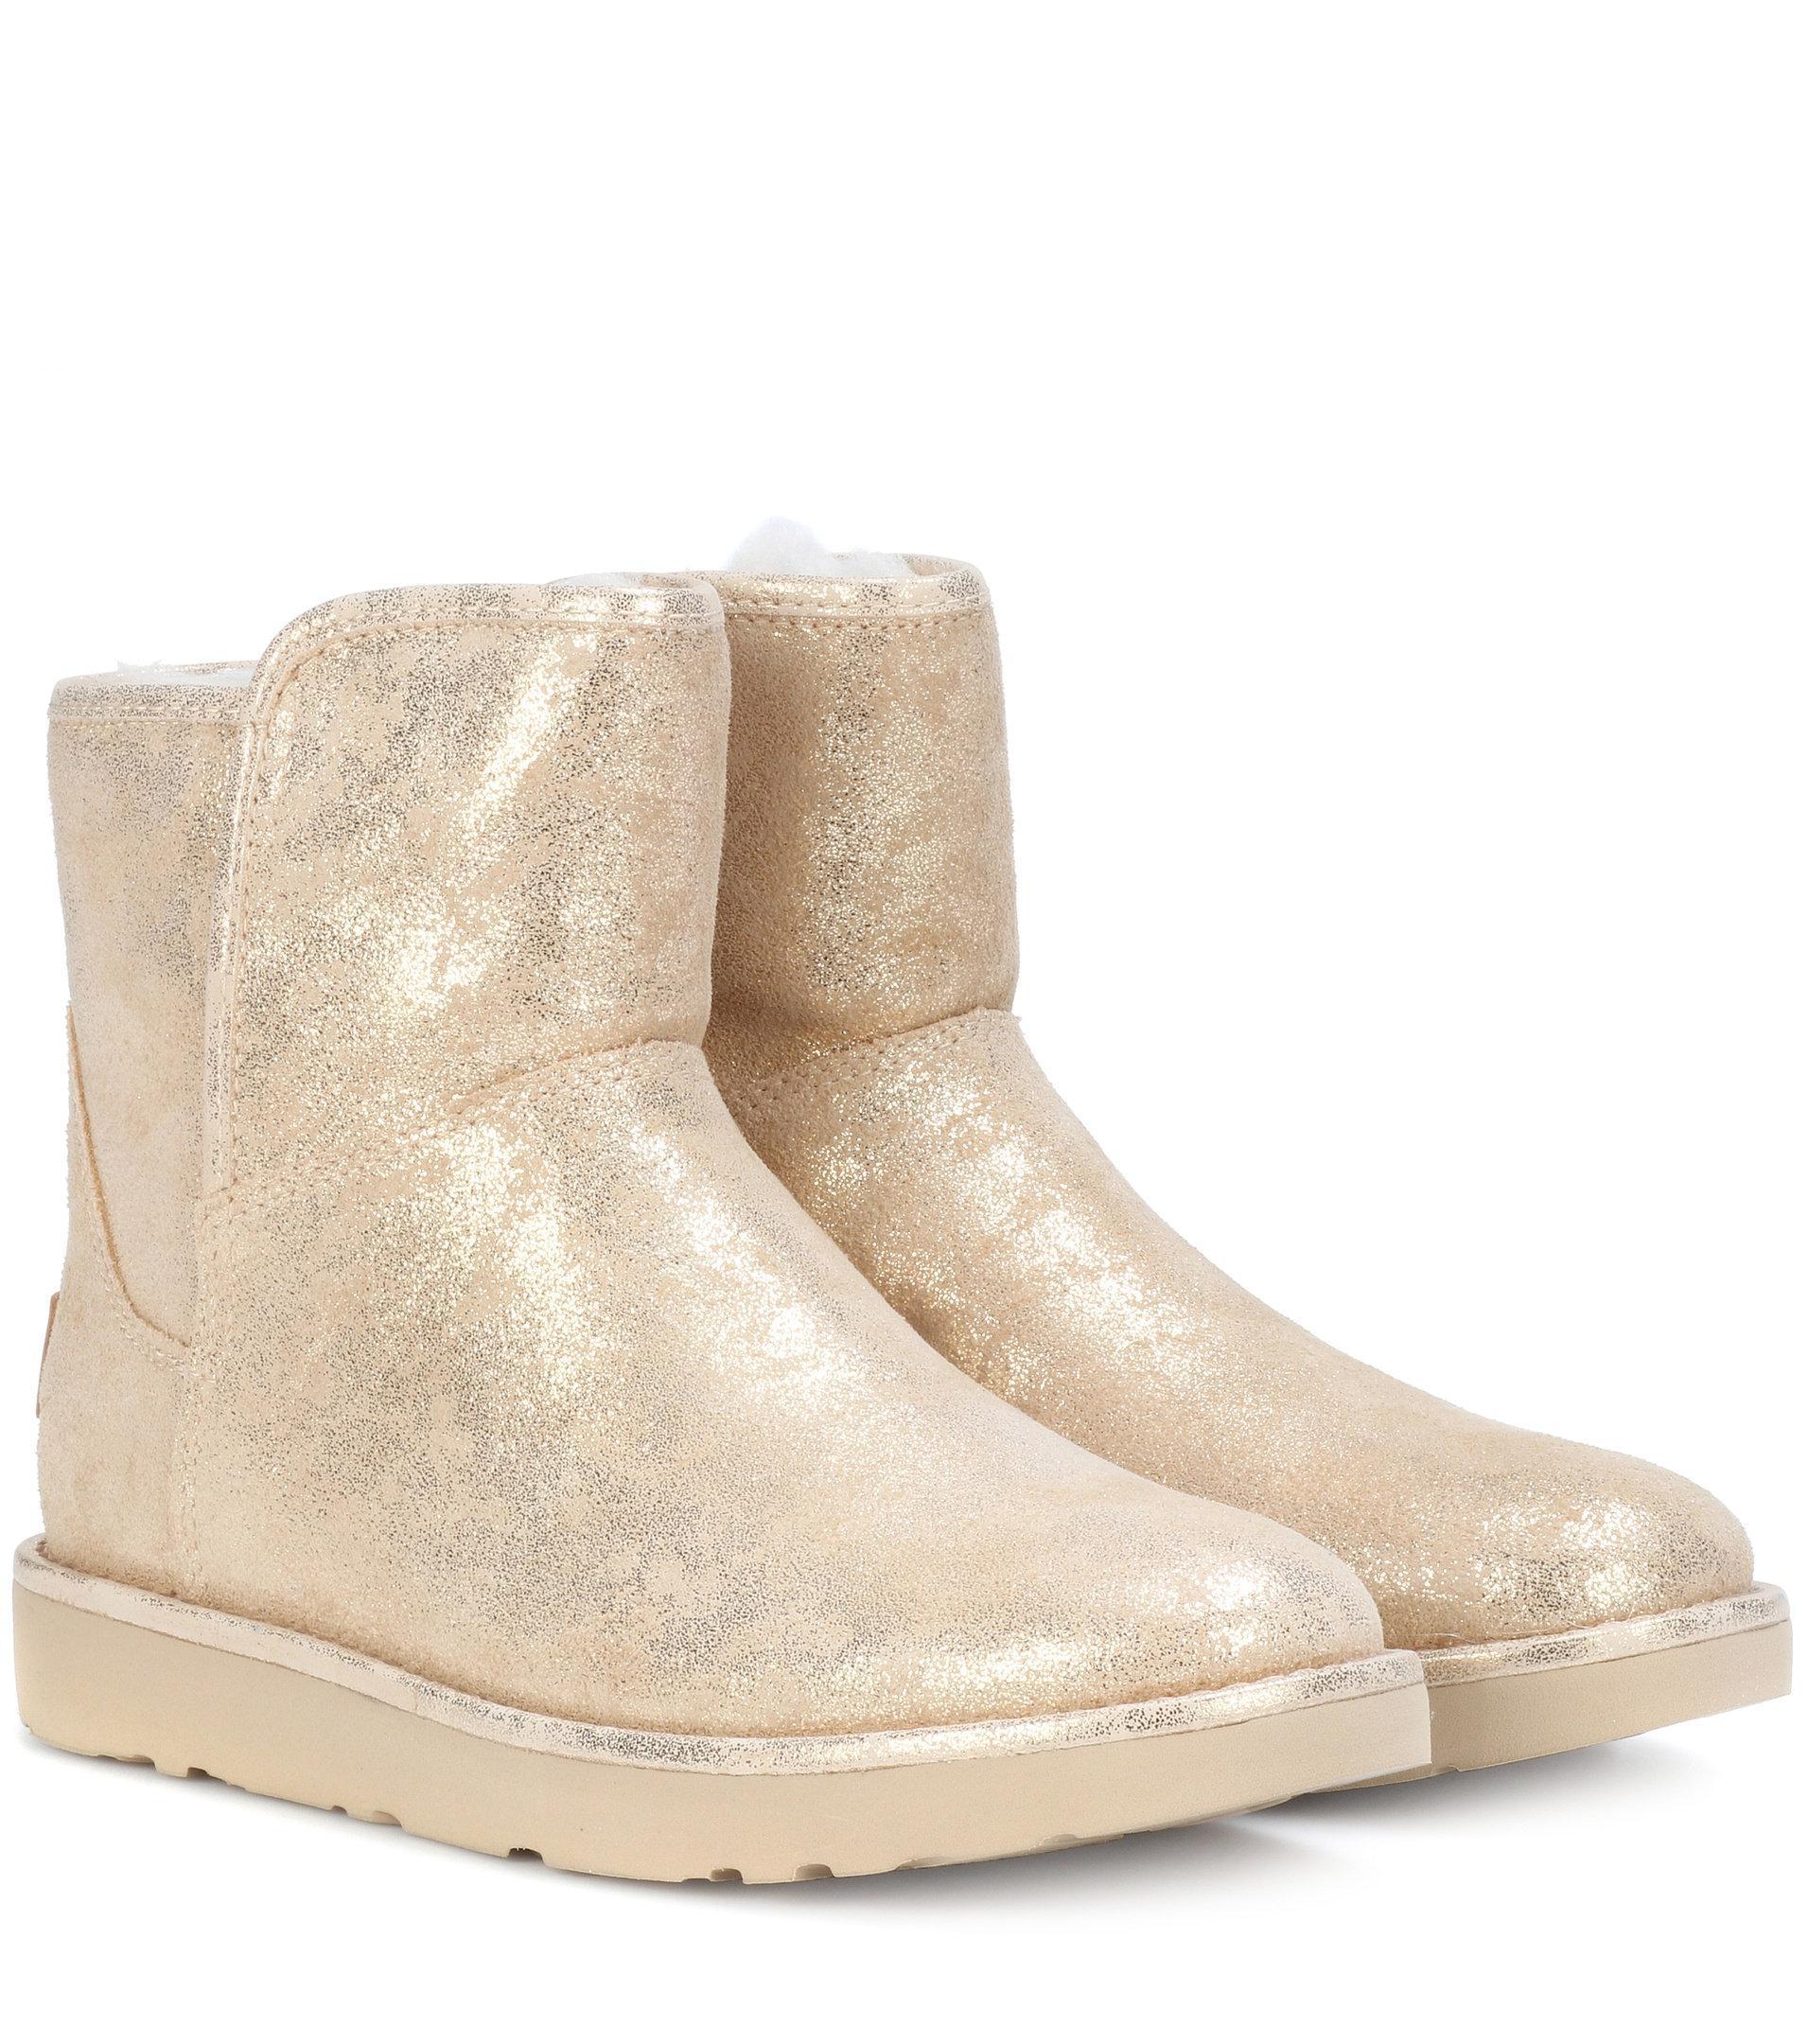 b86cbf92e03 Women's Metallic Abree Mini Stardust Ankle Boots